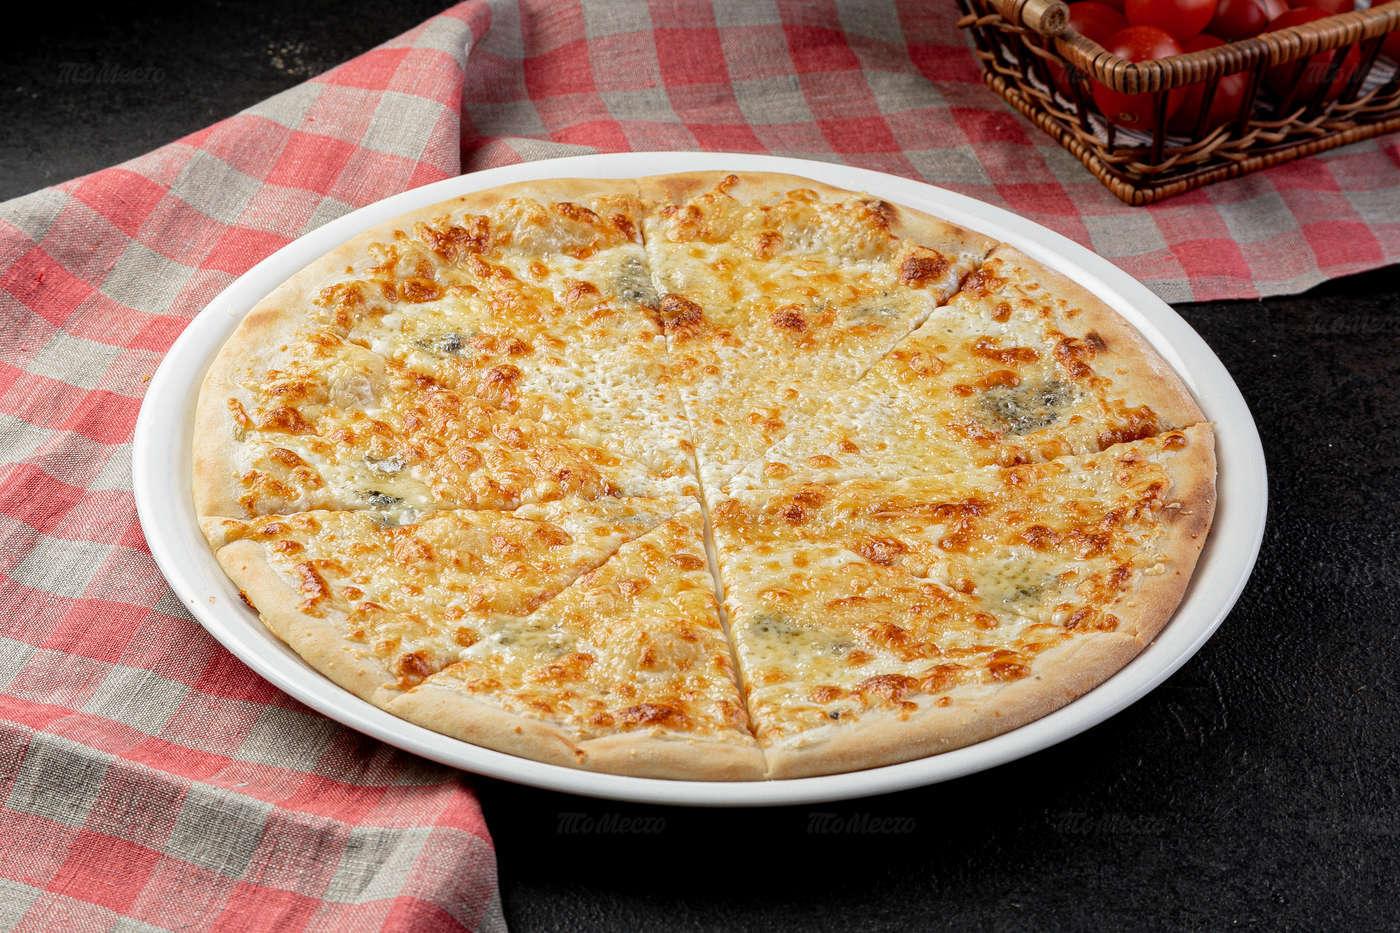 Меню ресторана Папа Пицциано (Papa Pizziano) на Новочеркасском проспекте фото 33